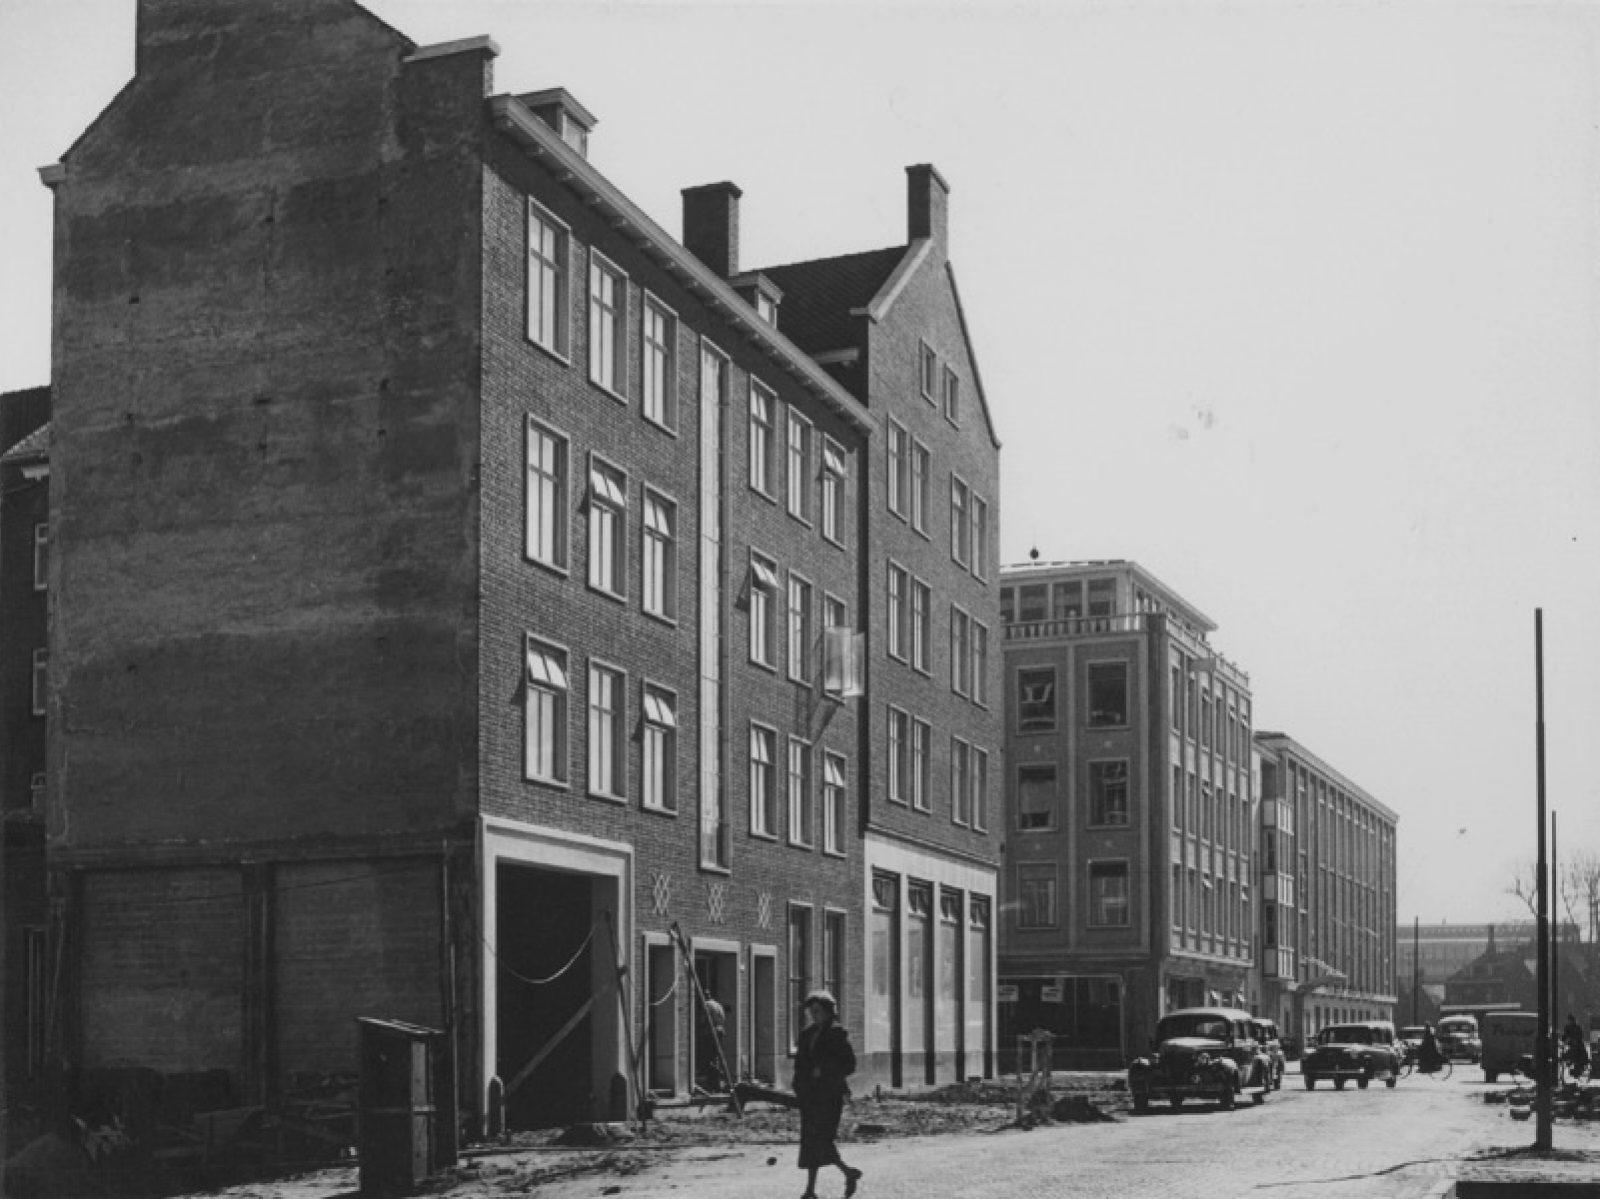 1951 Hartmann Wde Withstraat NL Rt SA 4202 IX 1139 03 01 01